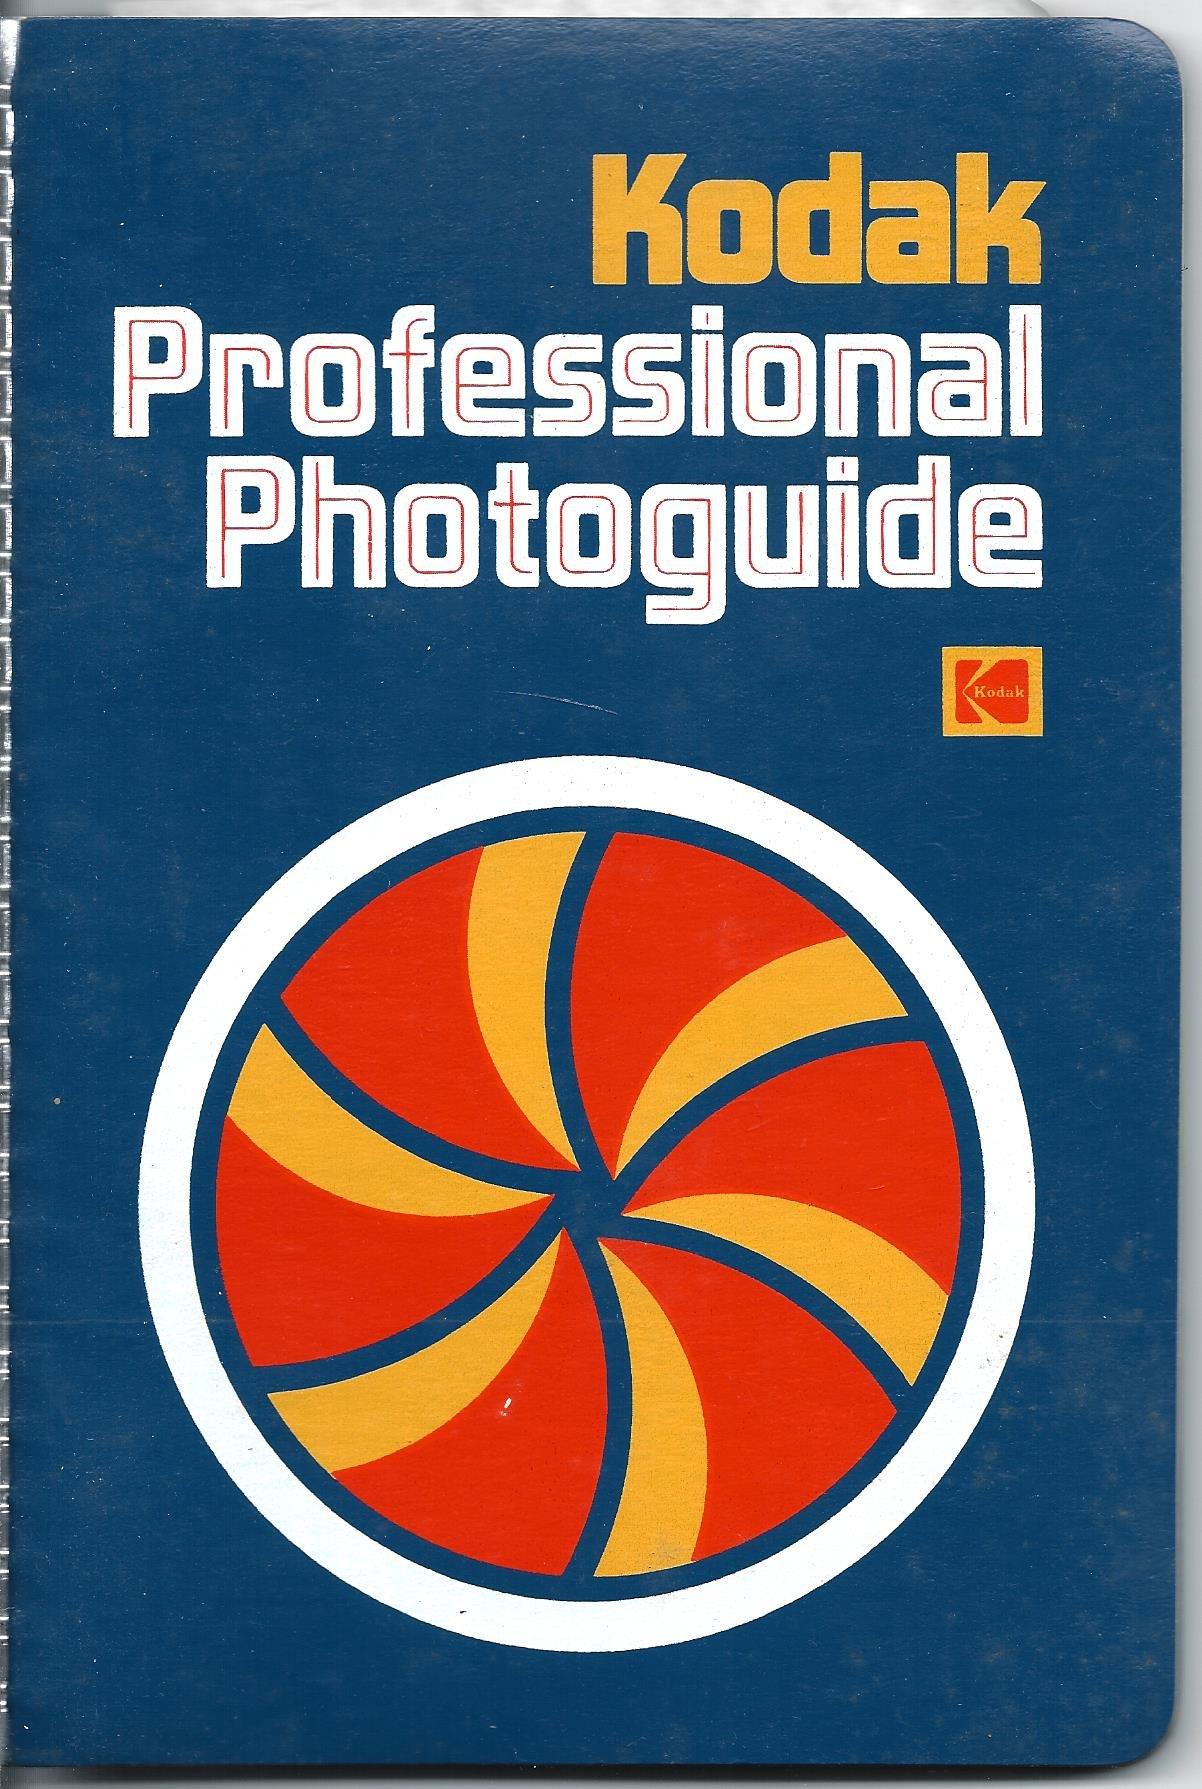 kodak professional photoguide kodak publication eastman kodak rh amazon com Photography Composition Kodak Kodak Color Photography